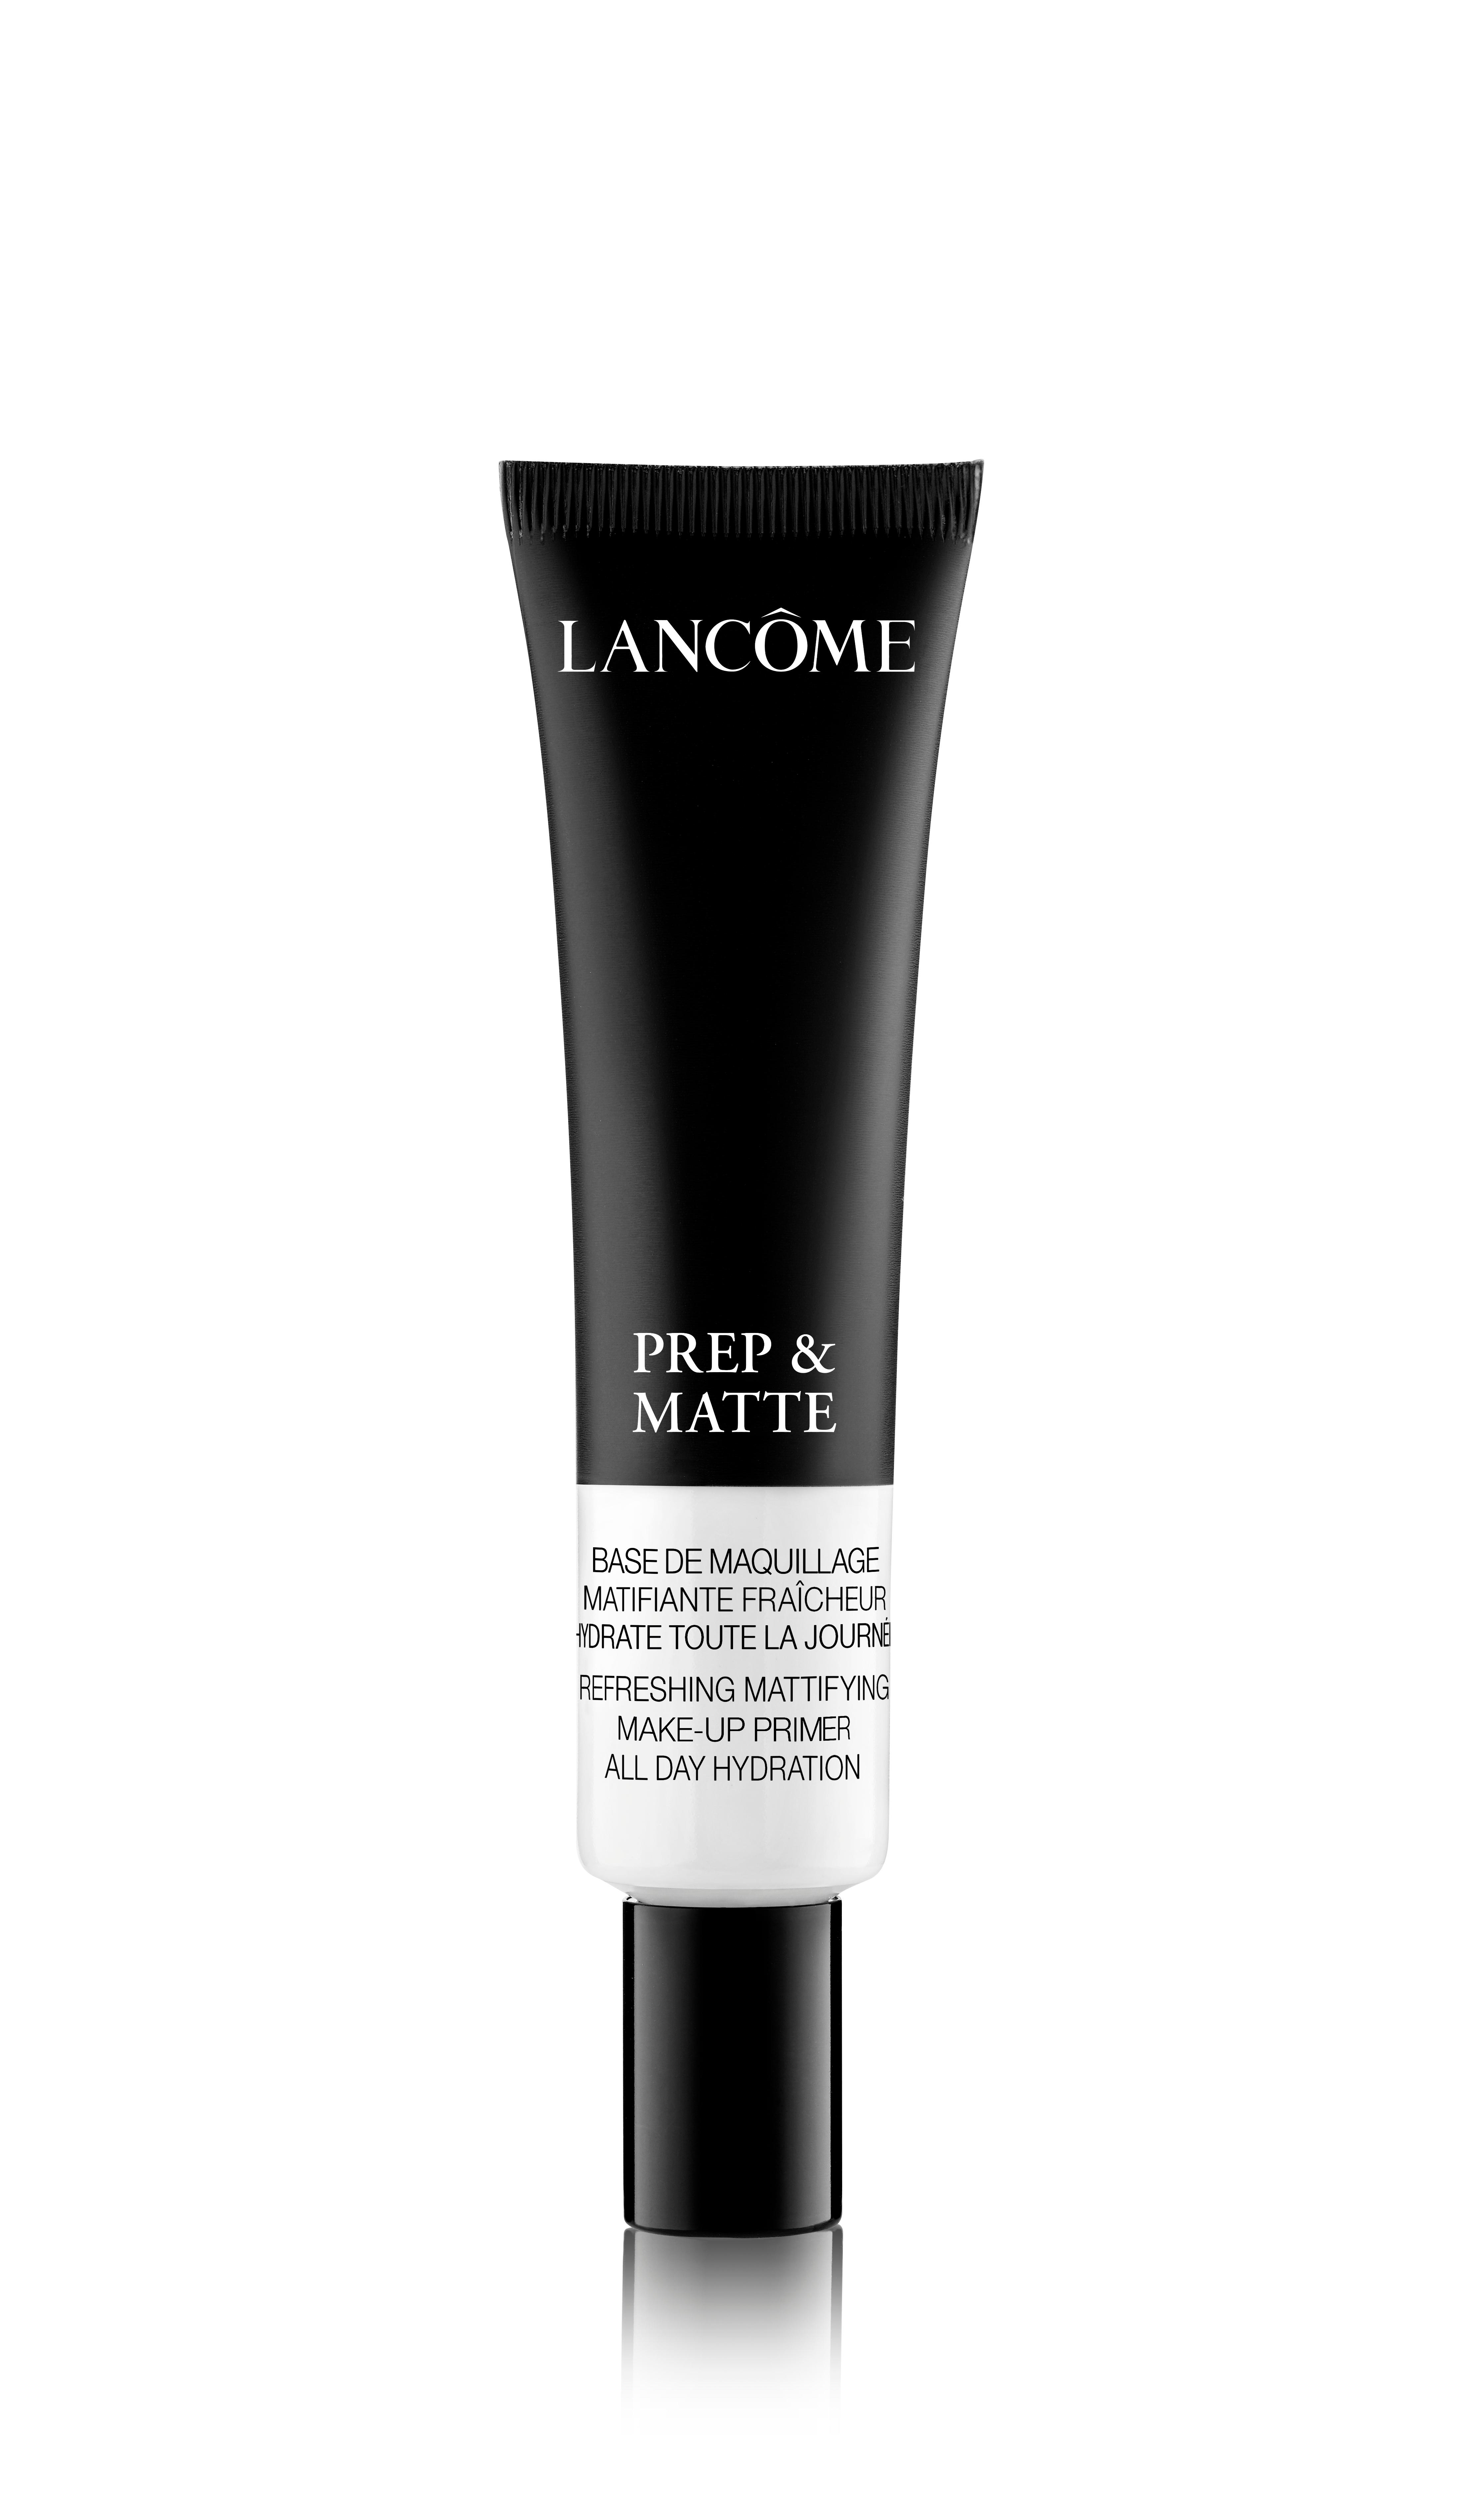 Lancôme Fresh Mattifying Primer, 25 ml